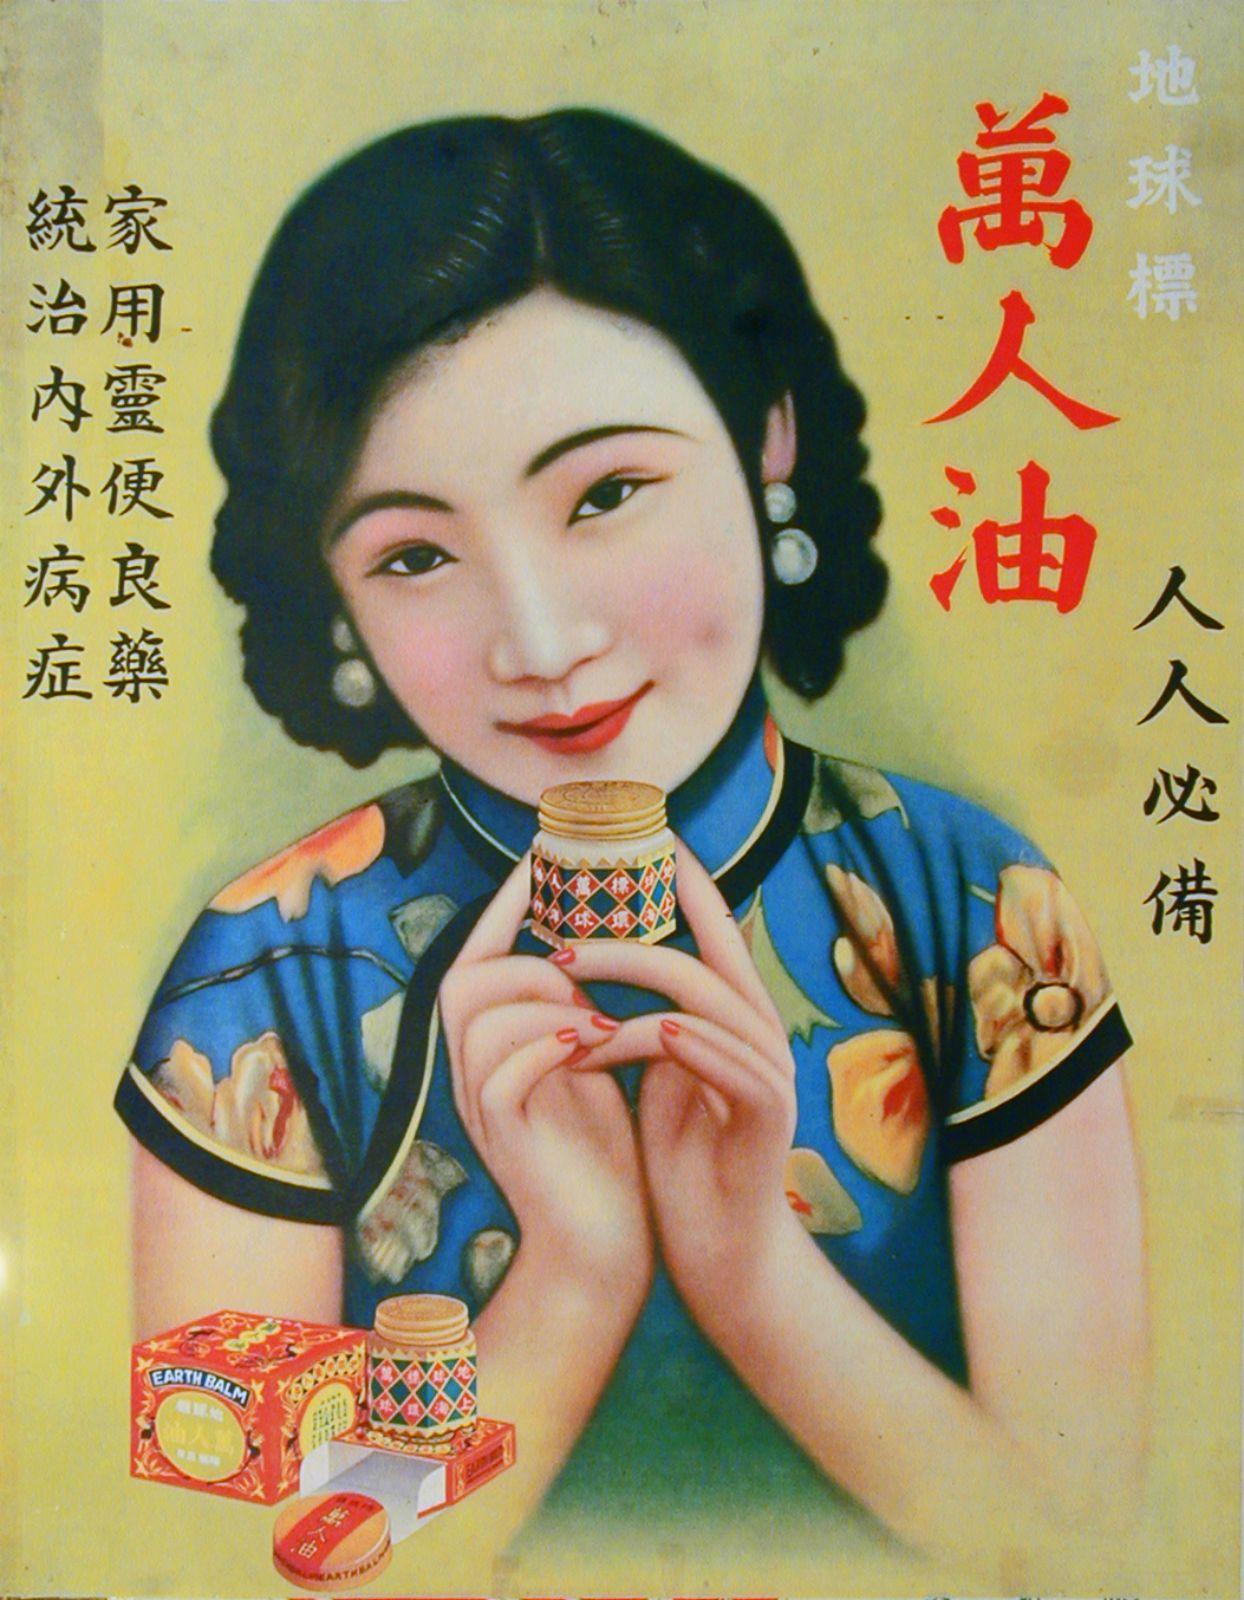 Hang Zhiying